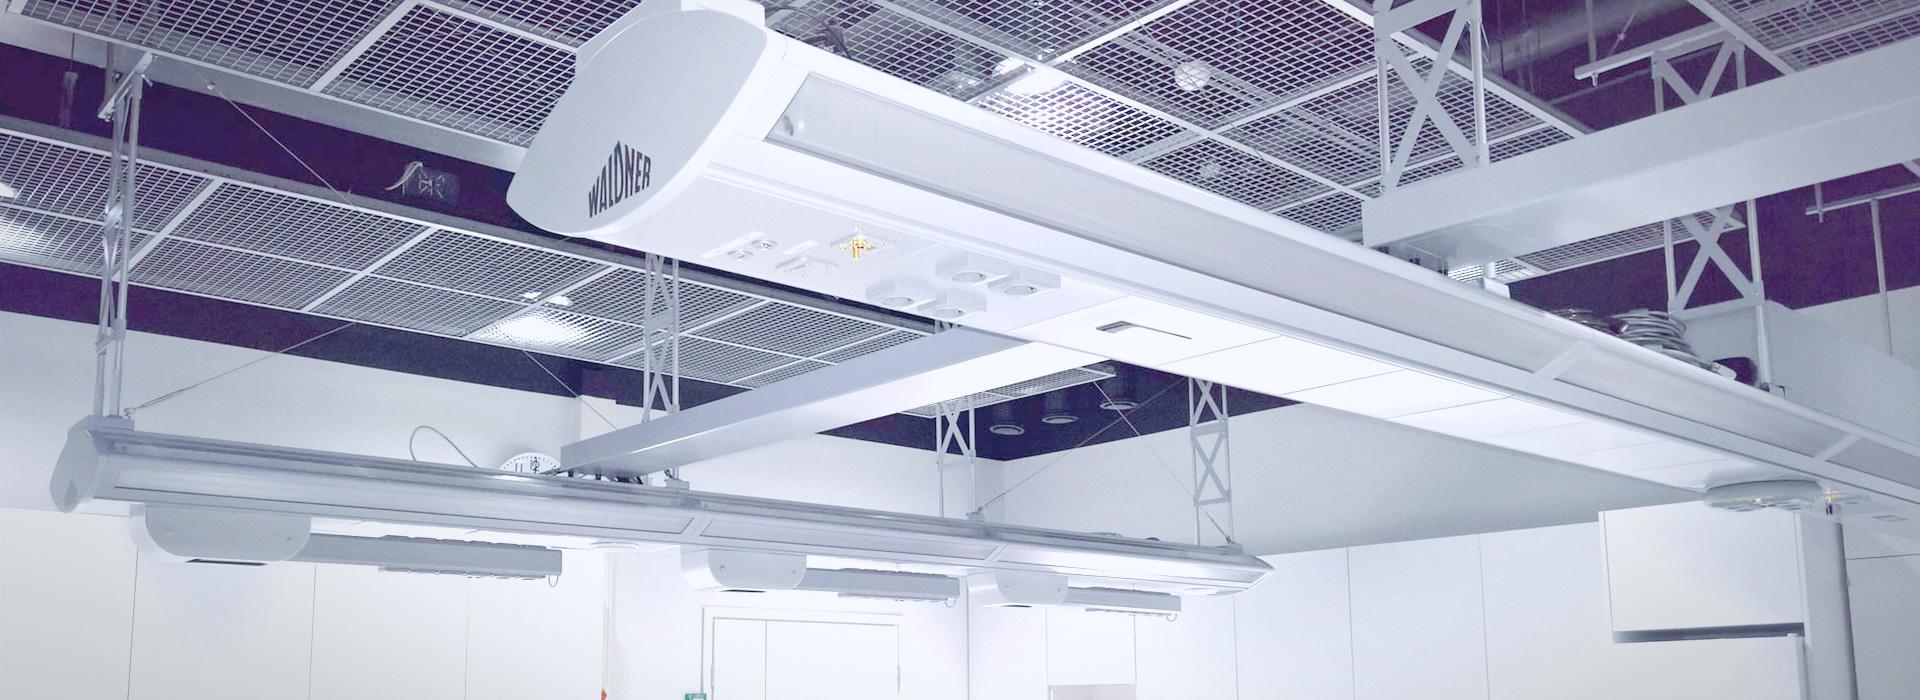 Image: Heureka science lab ceiling supply